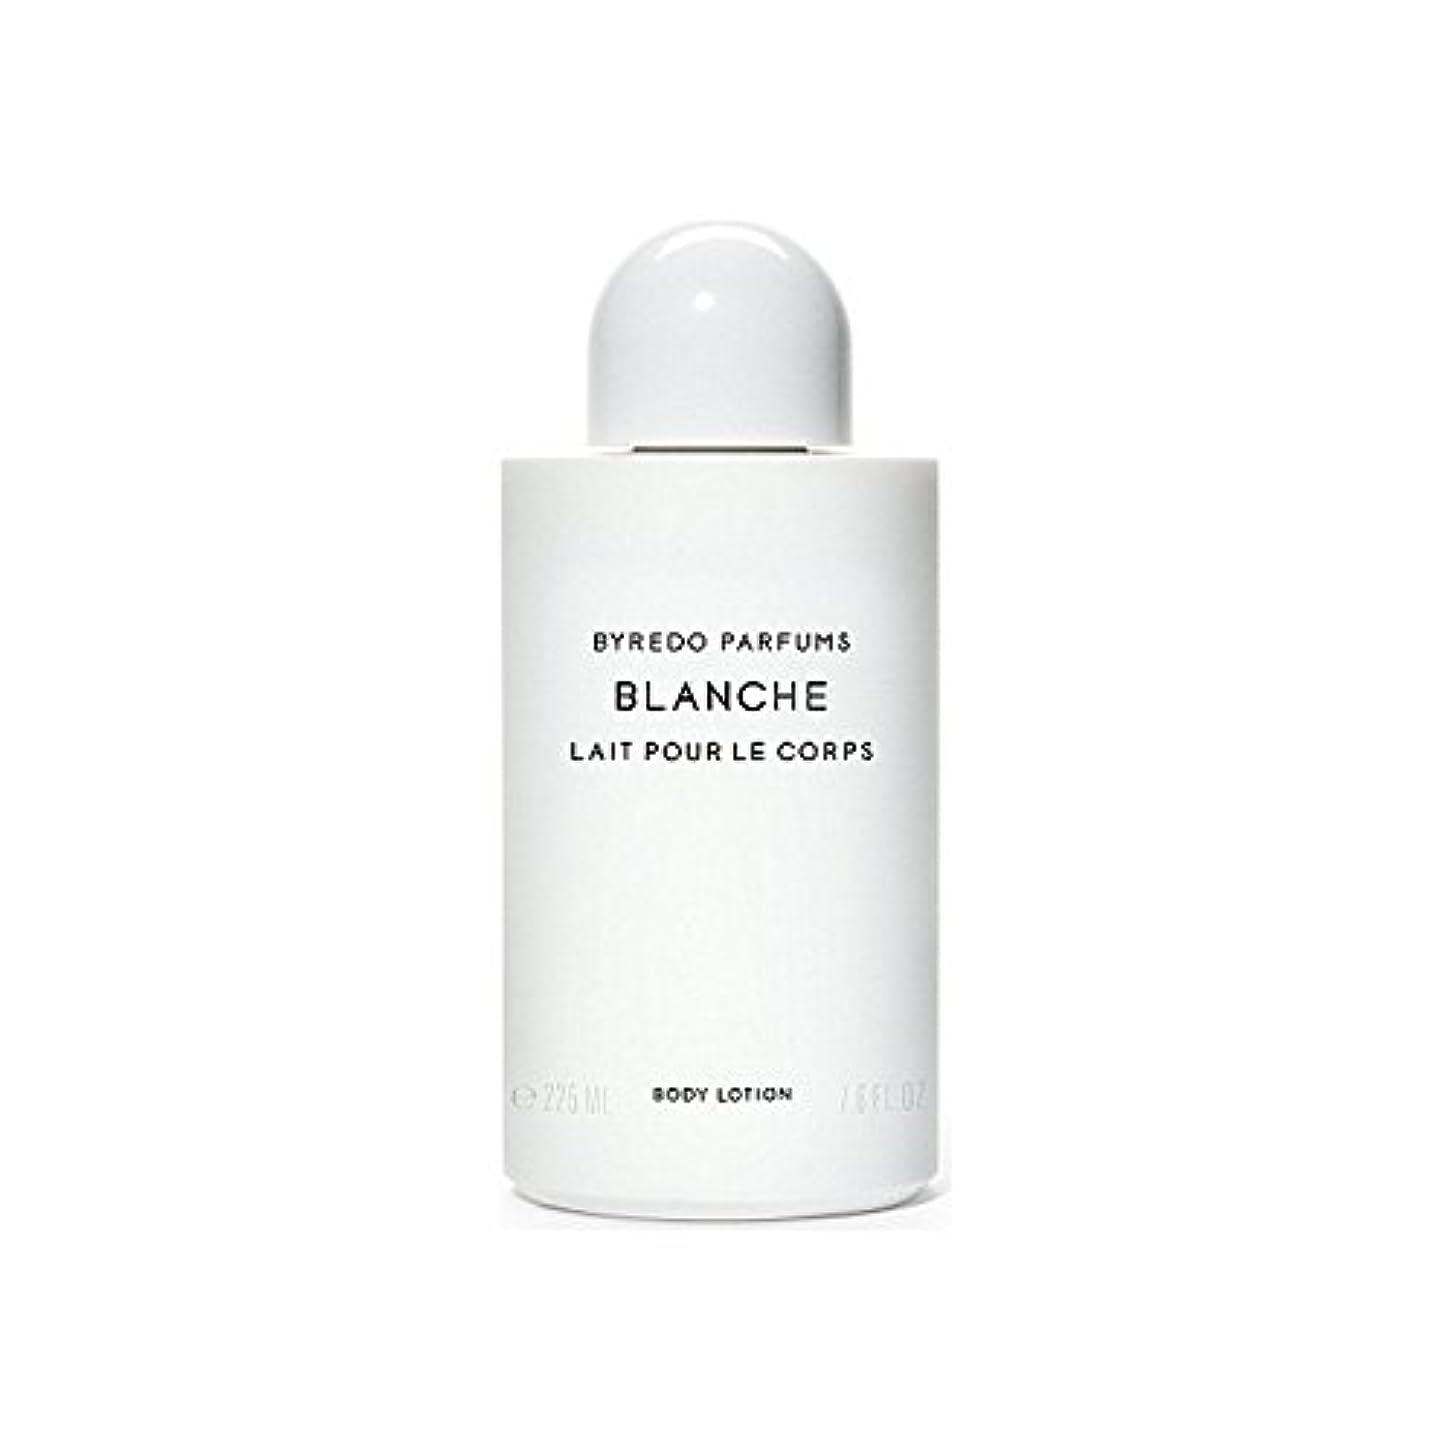 Byredo Blanche Body Lotion 225ml - ブランシュボディローション225ミリリットル [並行輸入品]